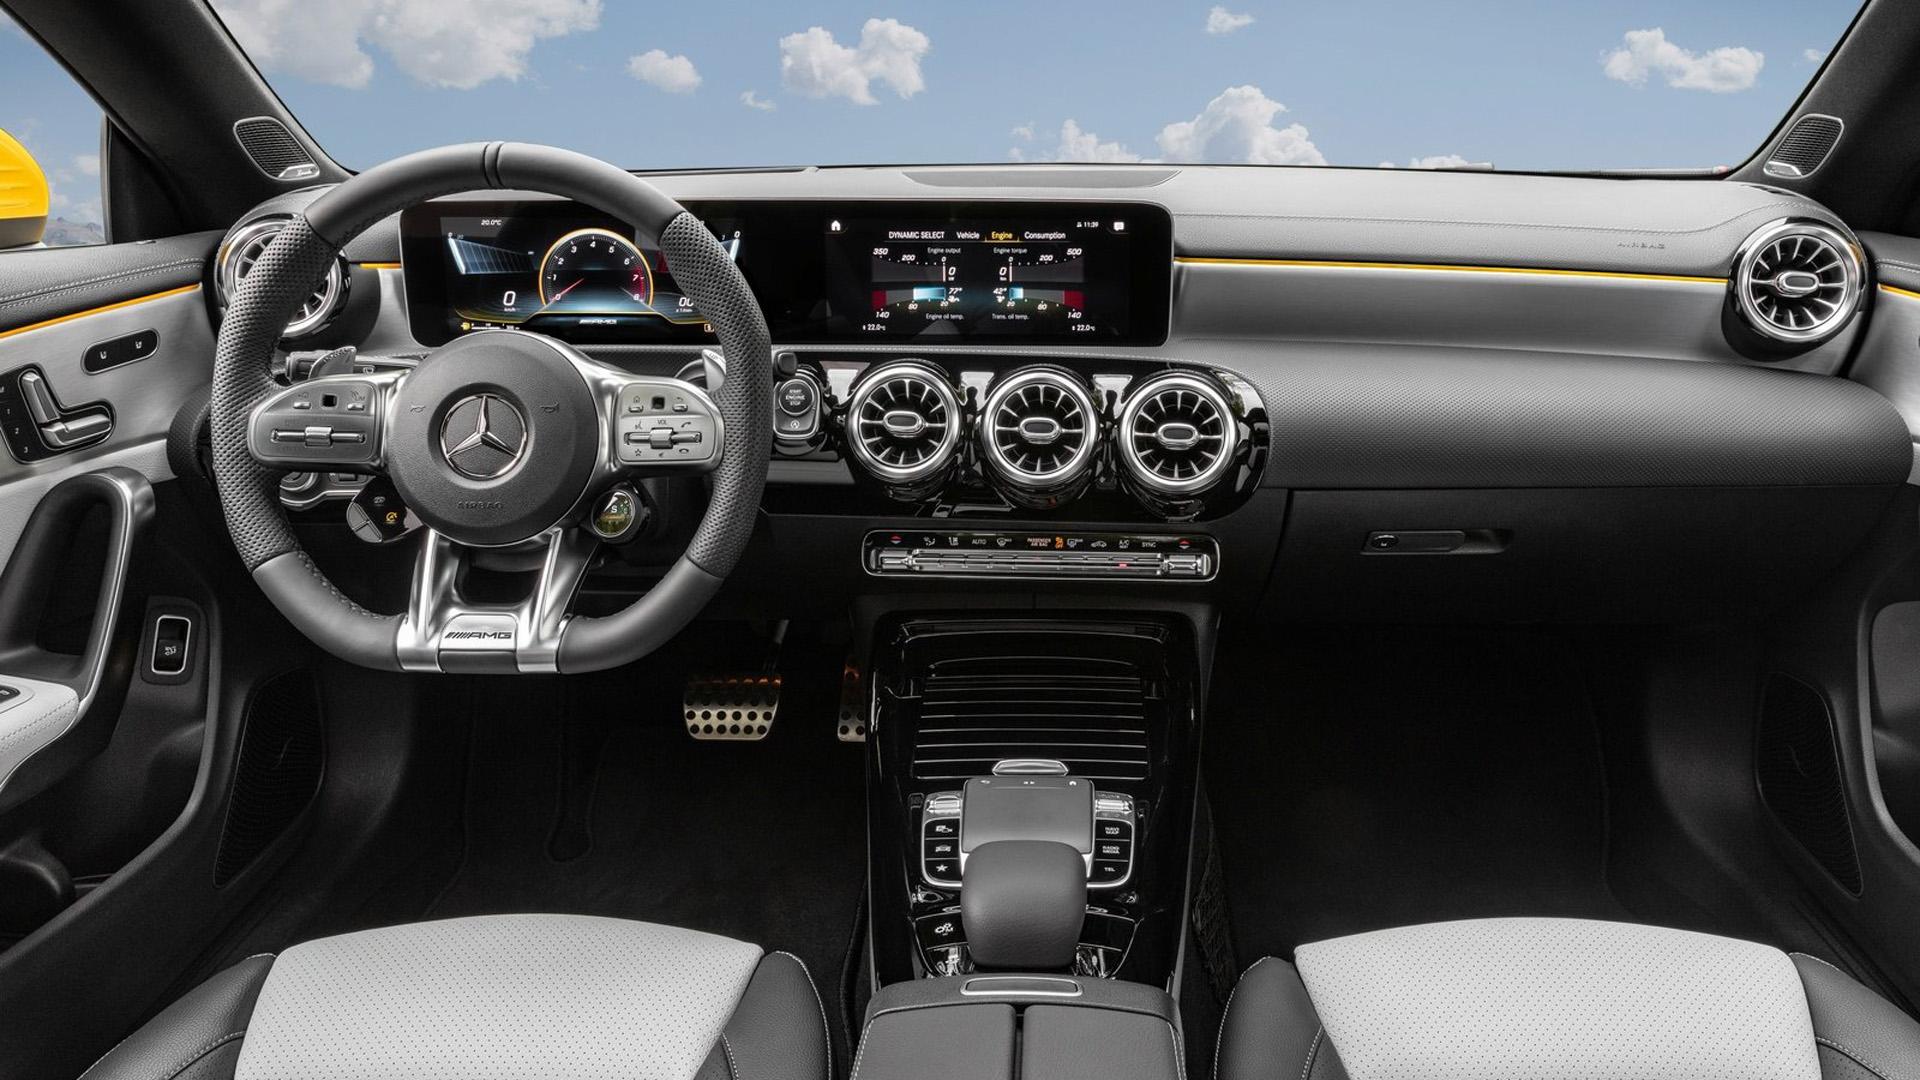 Mercedes CLA35 AMG 4Matic Shooting Brake